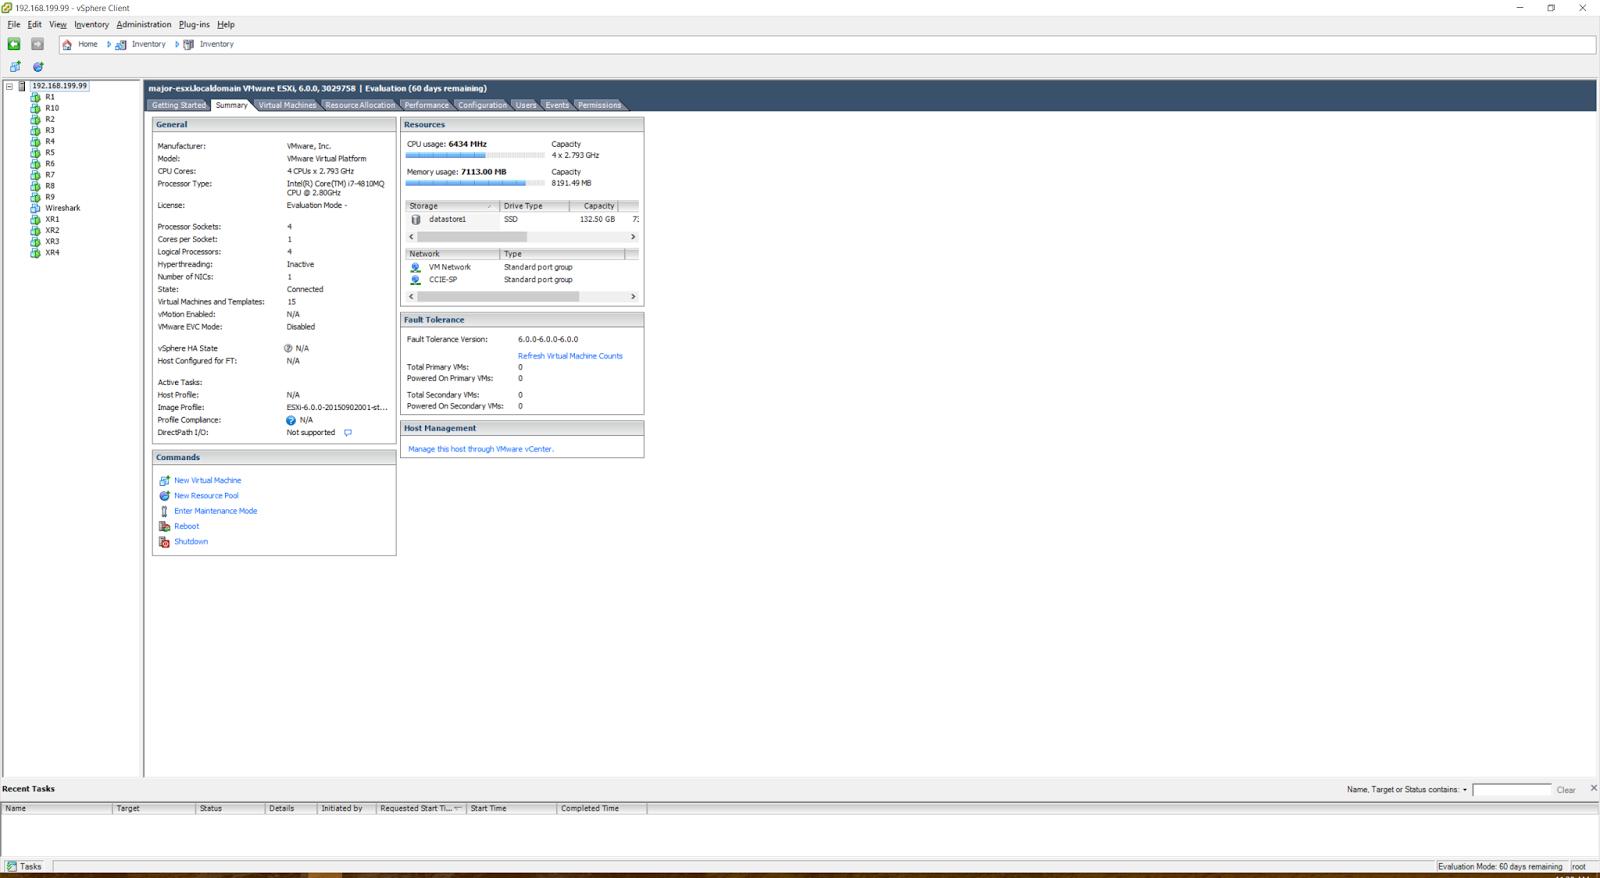 Network Knerd: CCIE SPv4 Lab: Running it on my laptop (w/only 16GB